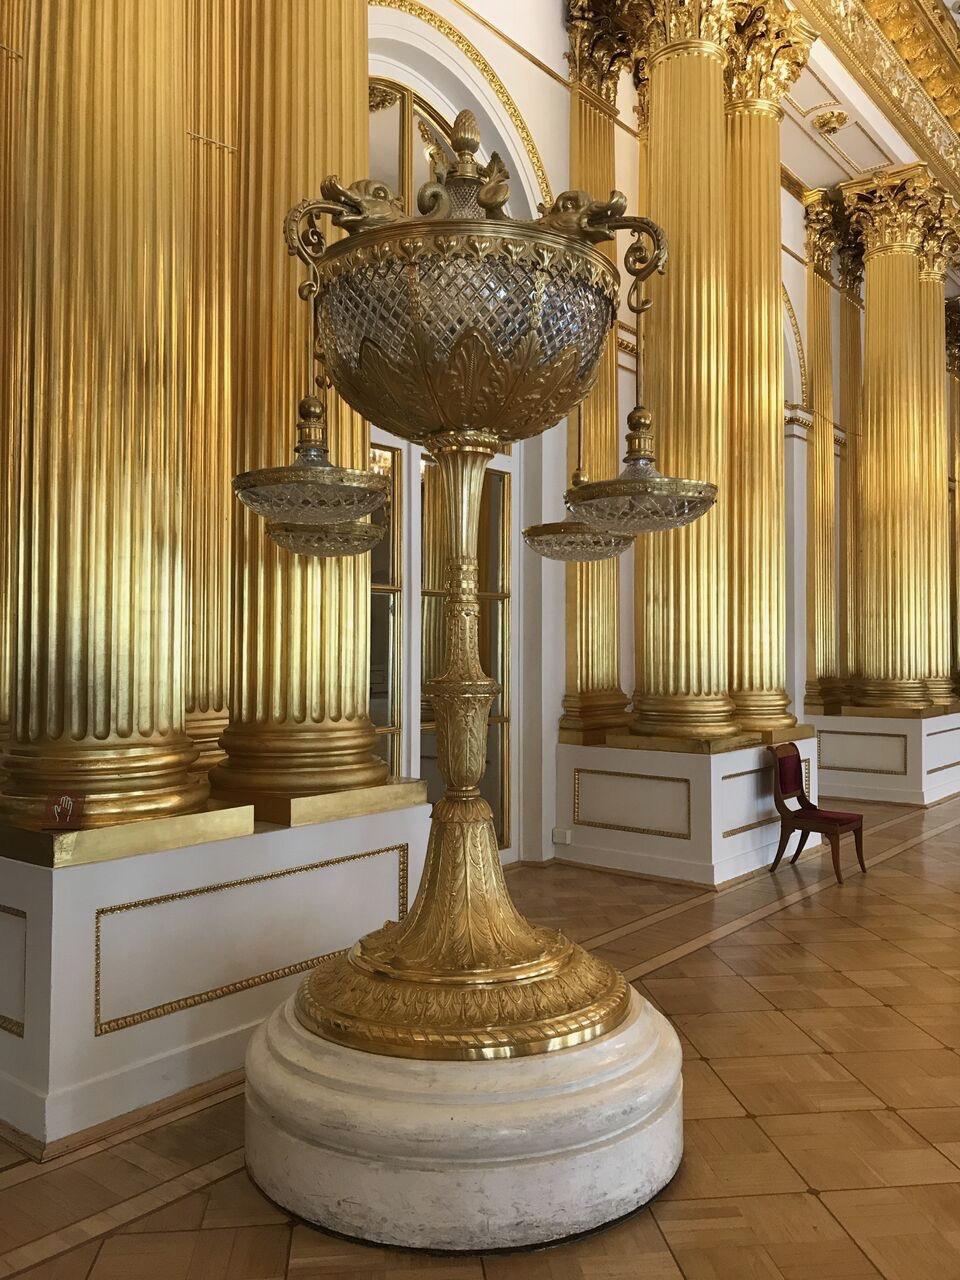 Teri_St.Petersburg_Hermitage_day2_spiritedtable_photo46.jpg